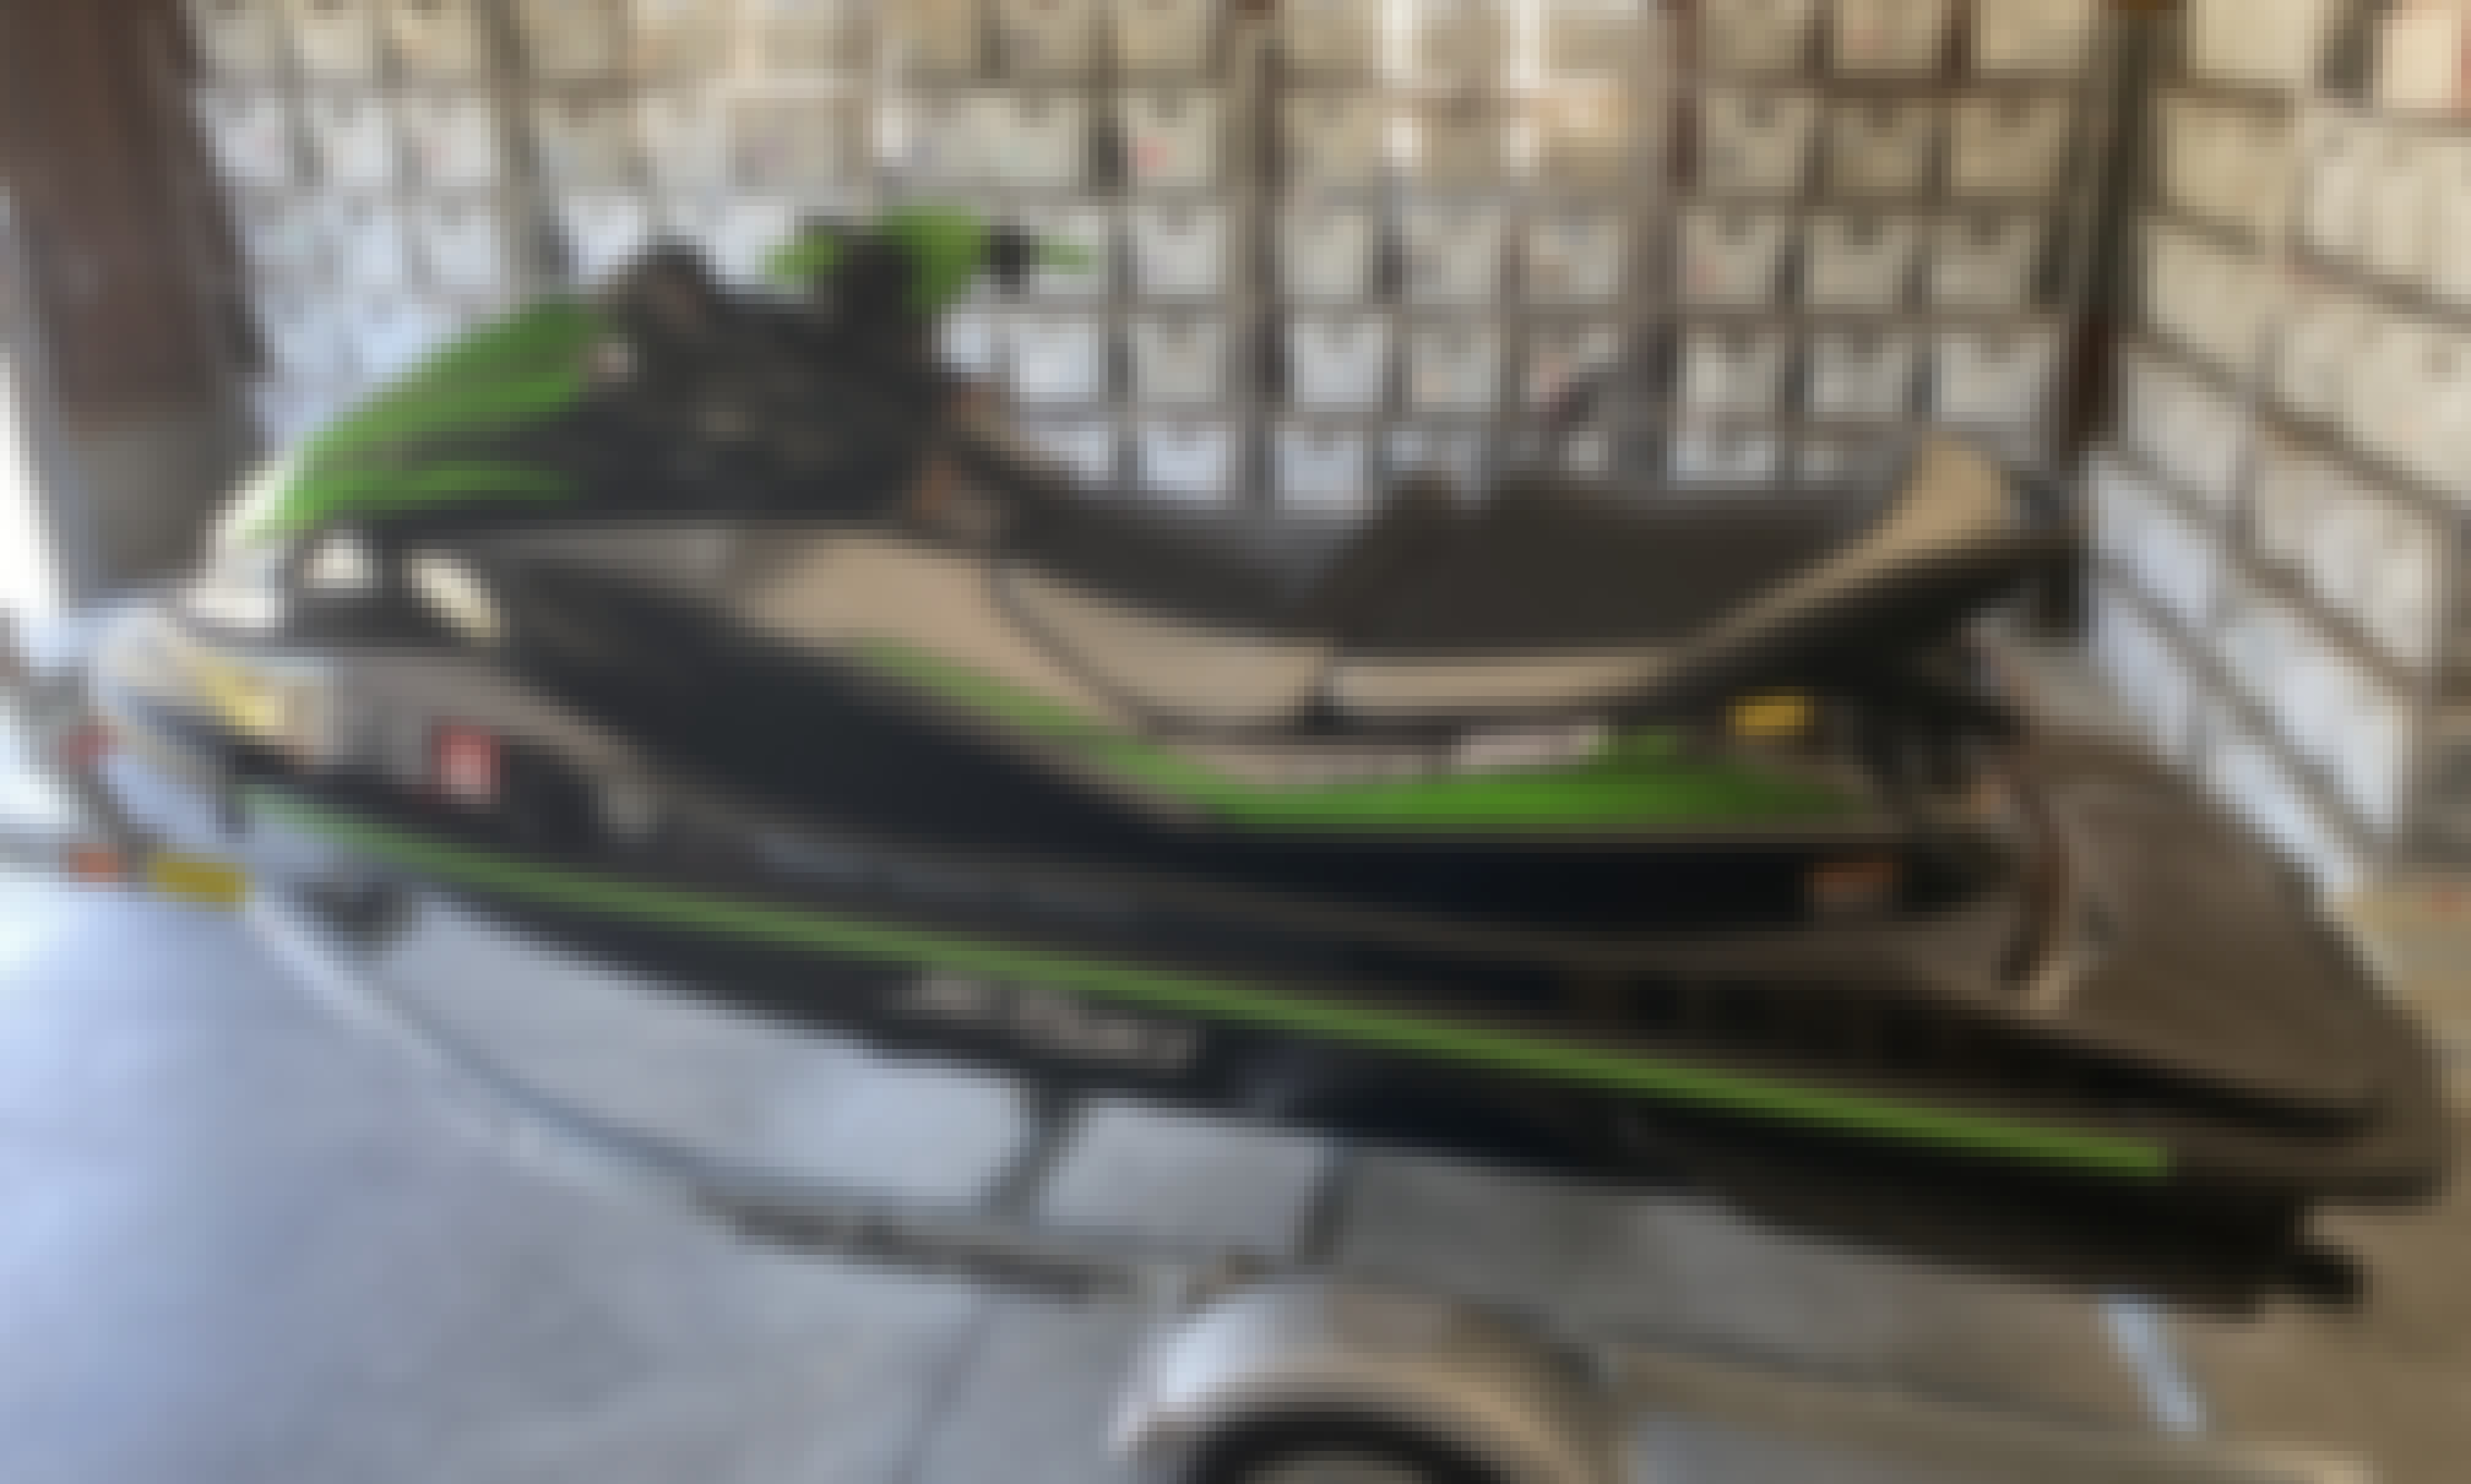 Kawasaki STX 160 Jet Ski in Hubert, North Carolina